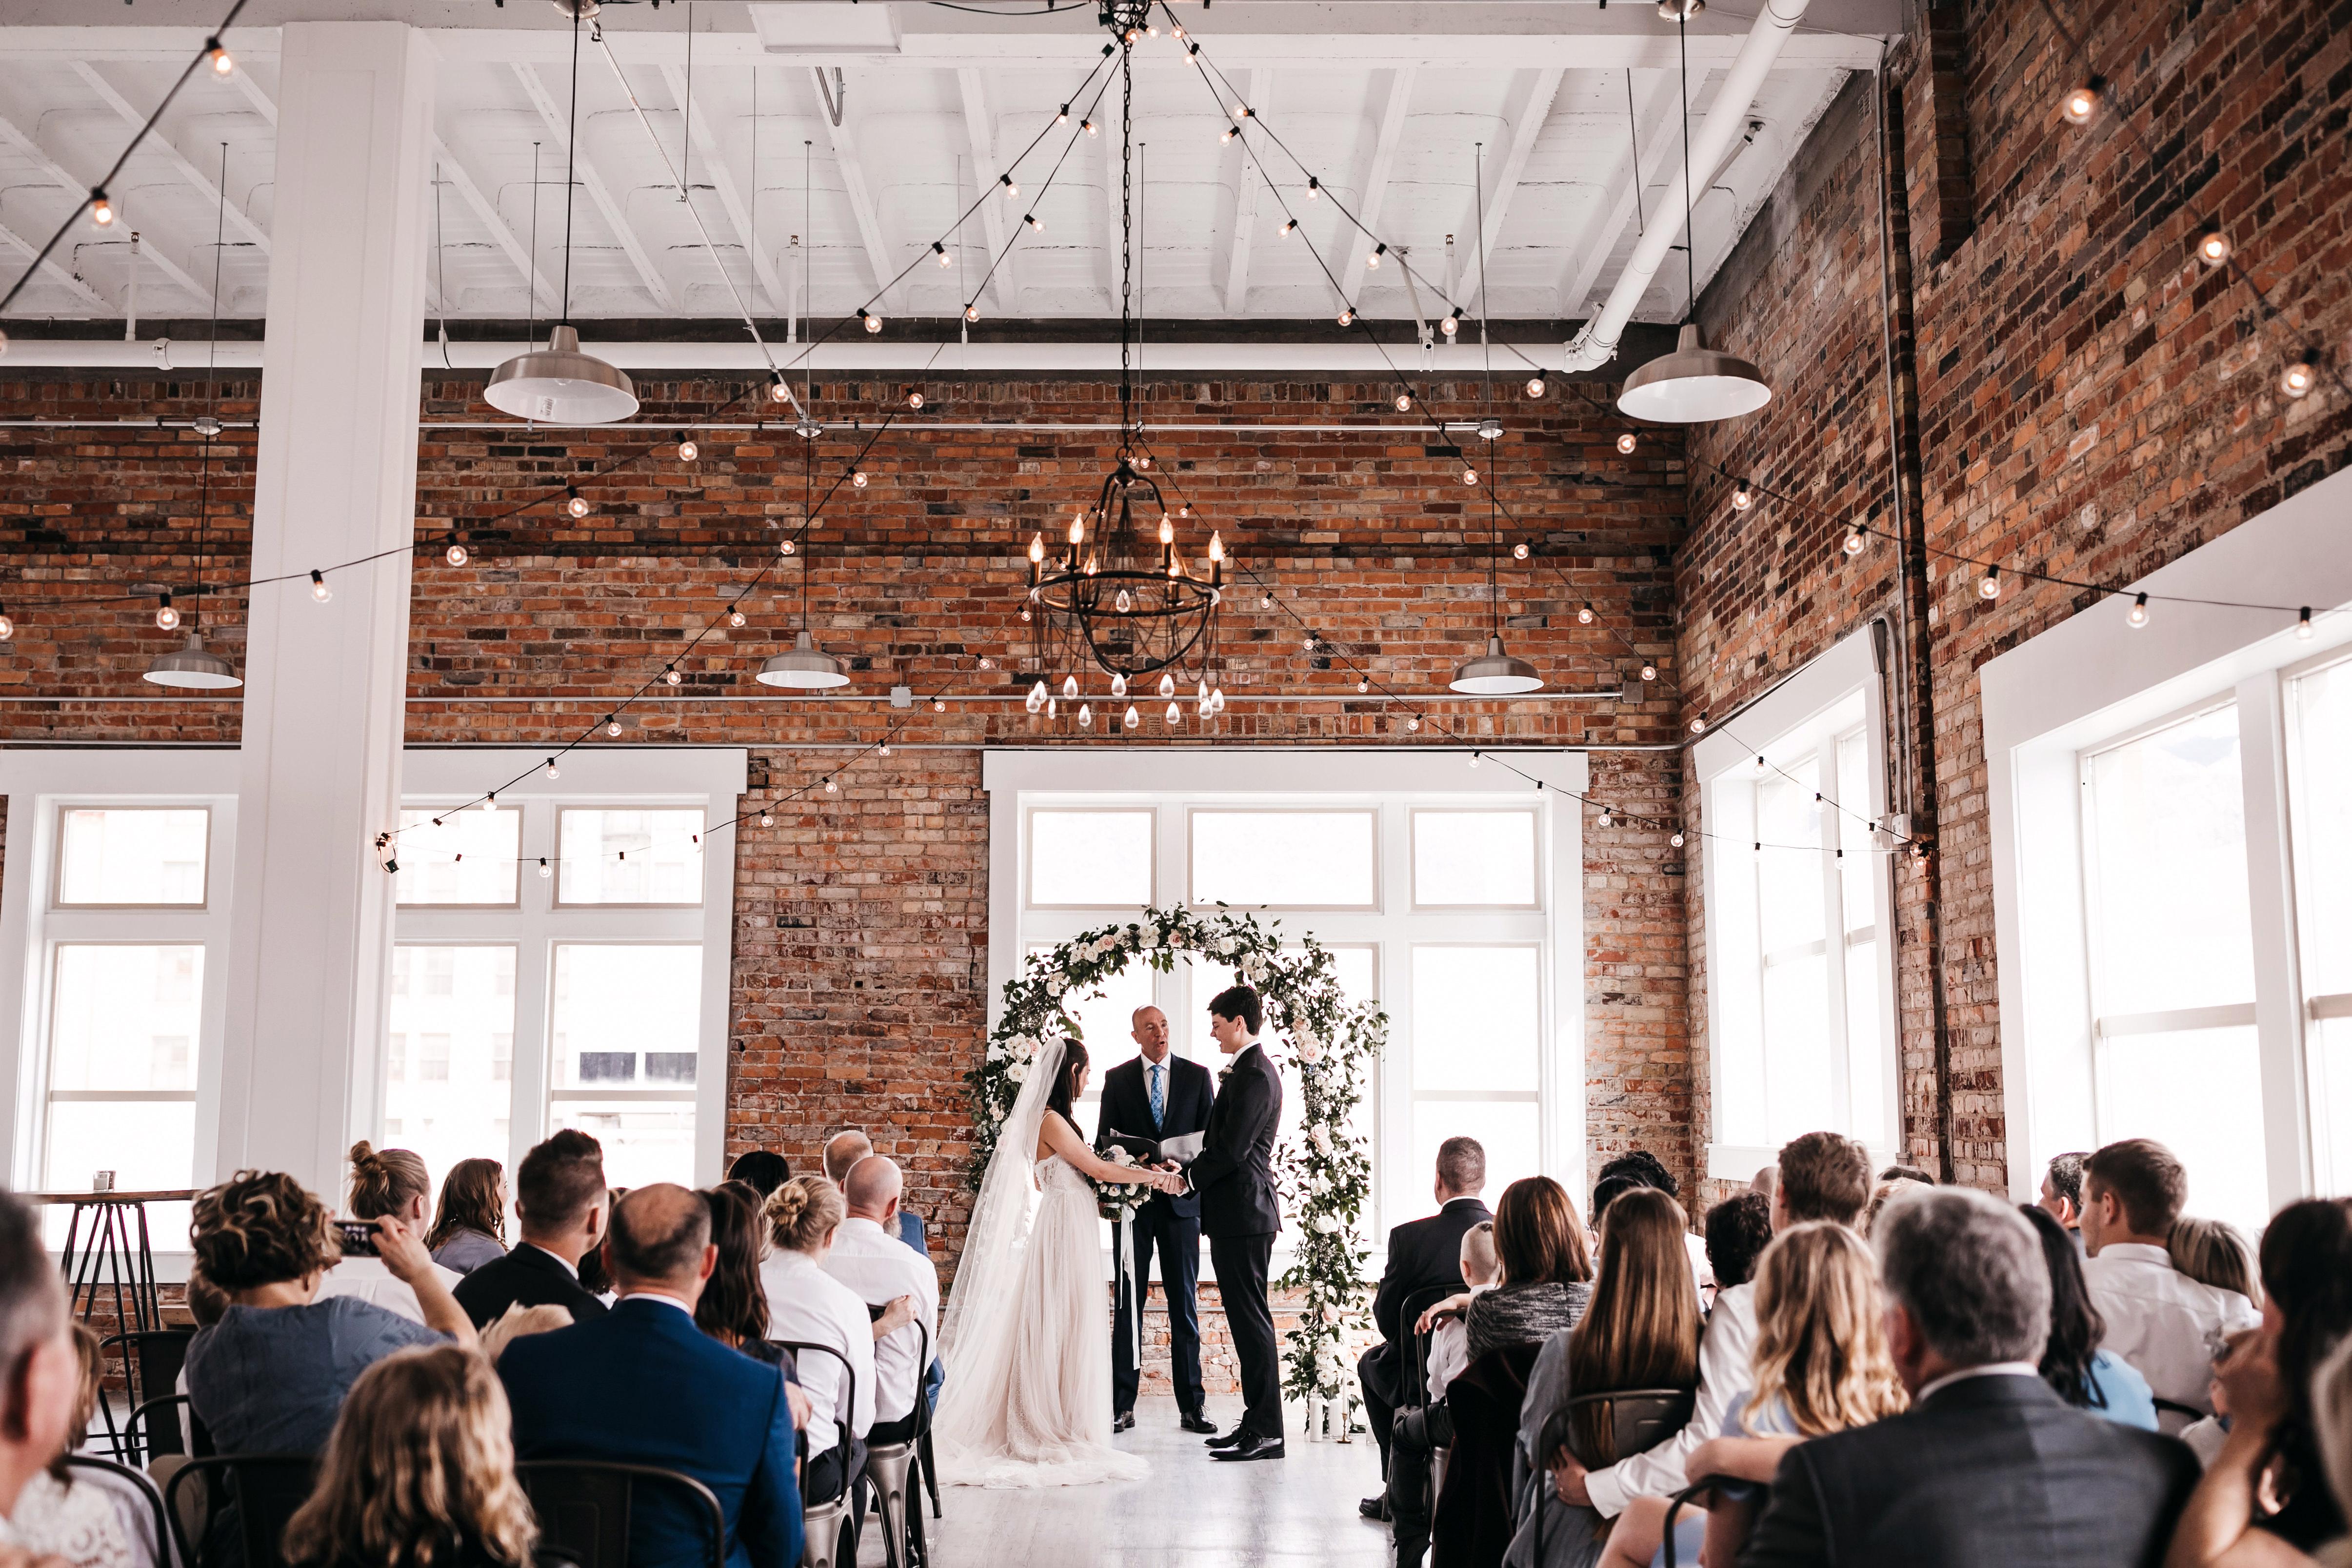 Maddi + Andrew Wedding - The Fifth Floor, Ogden, Utah - Christie Q Photography - 105- CBQQ5033